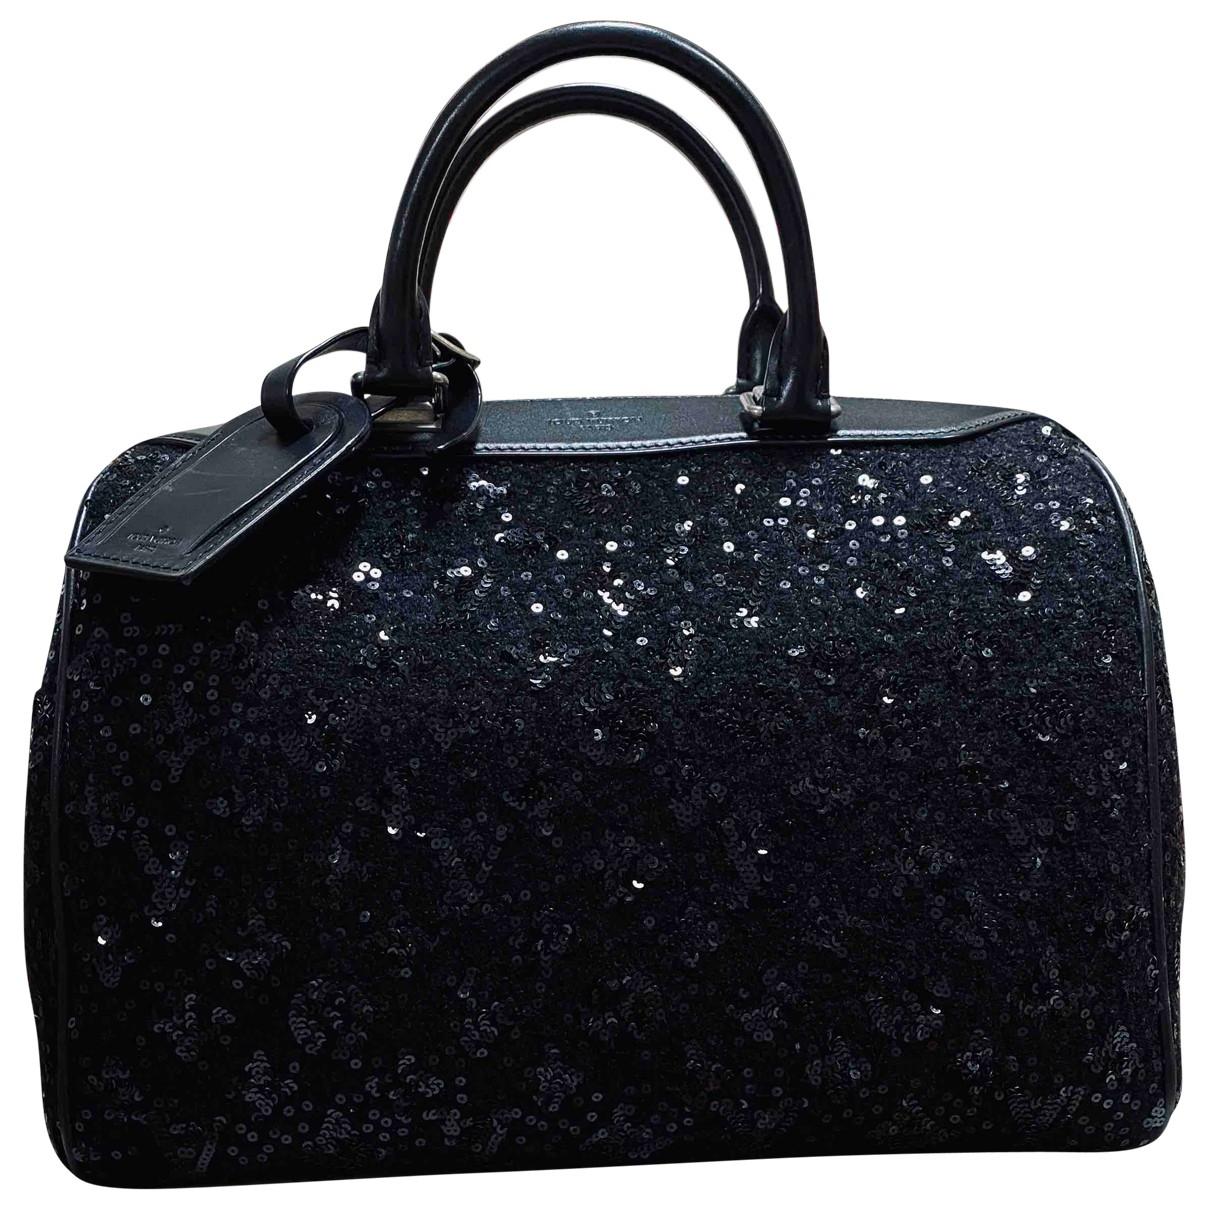 Louis Vuitton Speedy Black Glitter handbag for Women \N